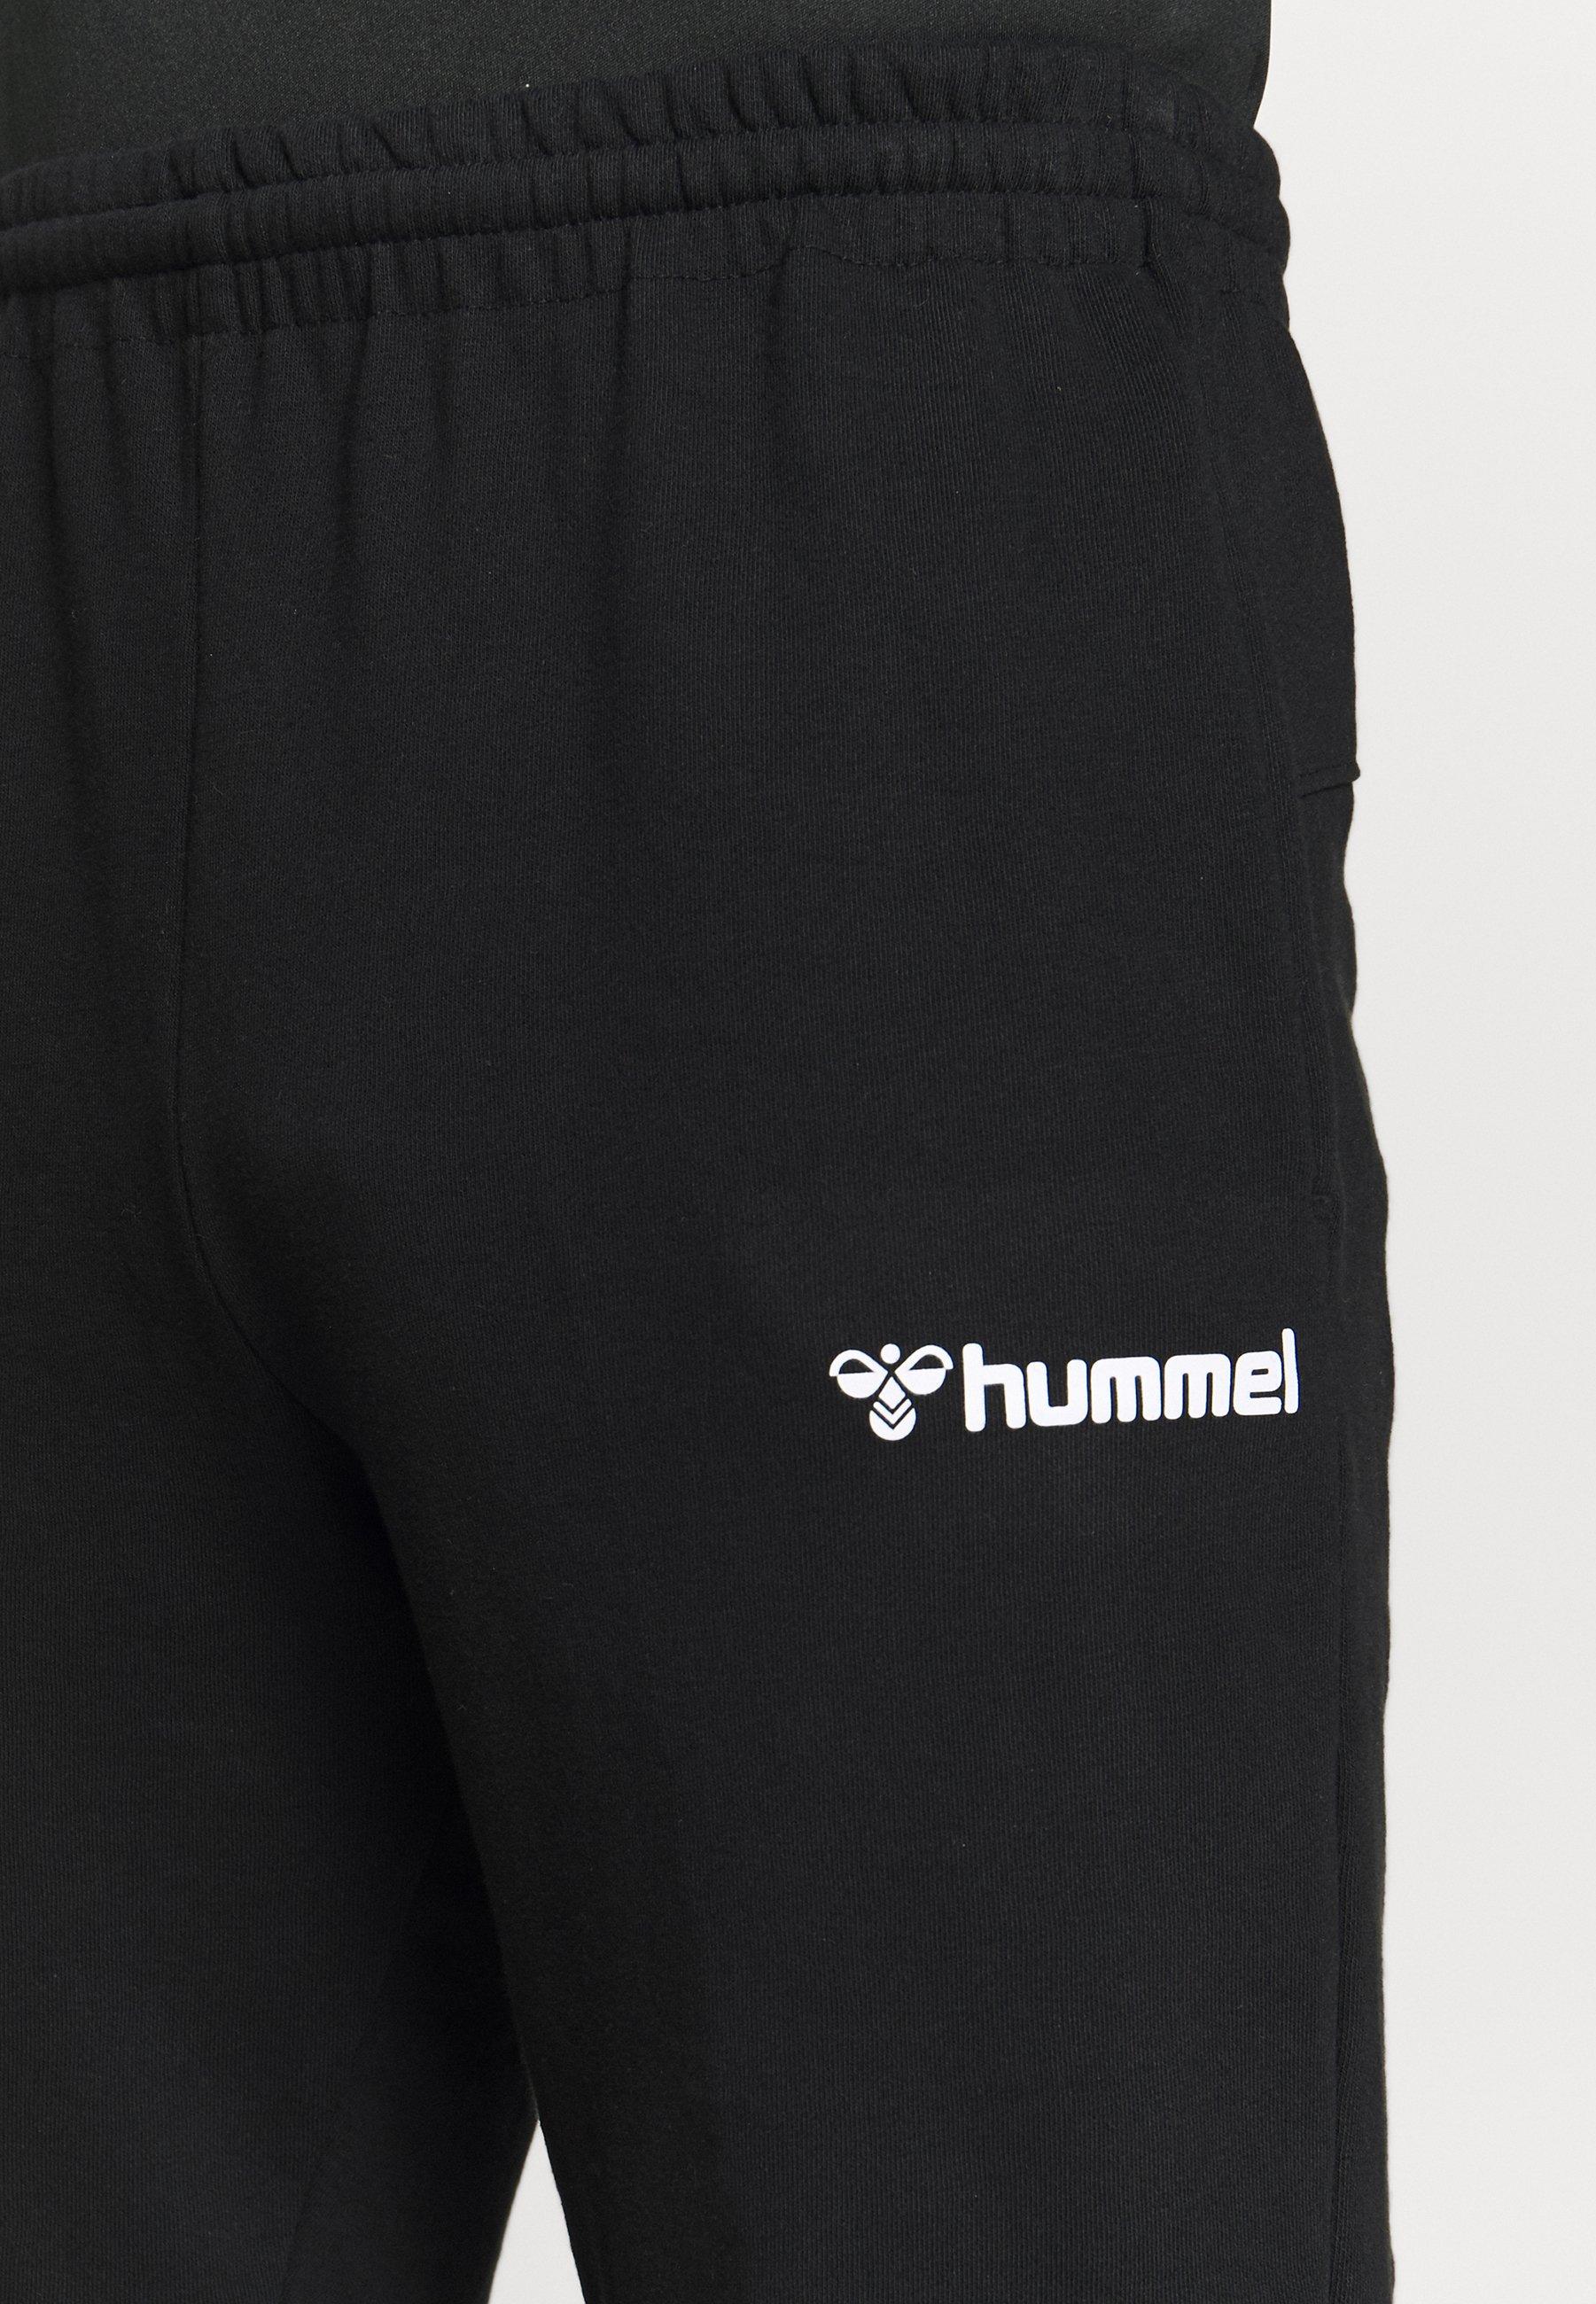 Hummel Authentic Pant - Träningsbyxor Black/white